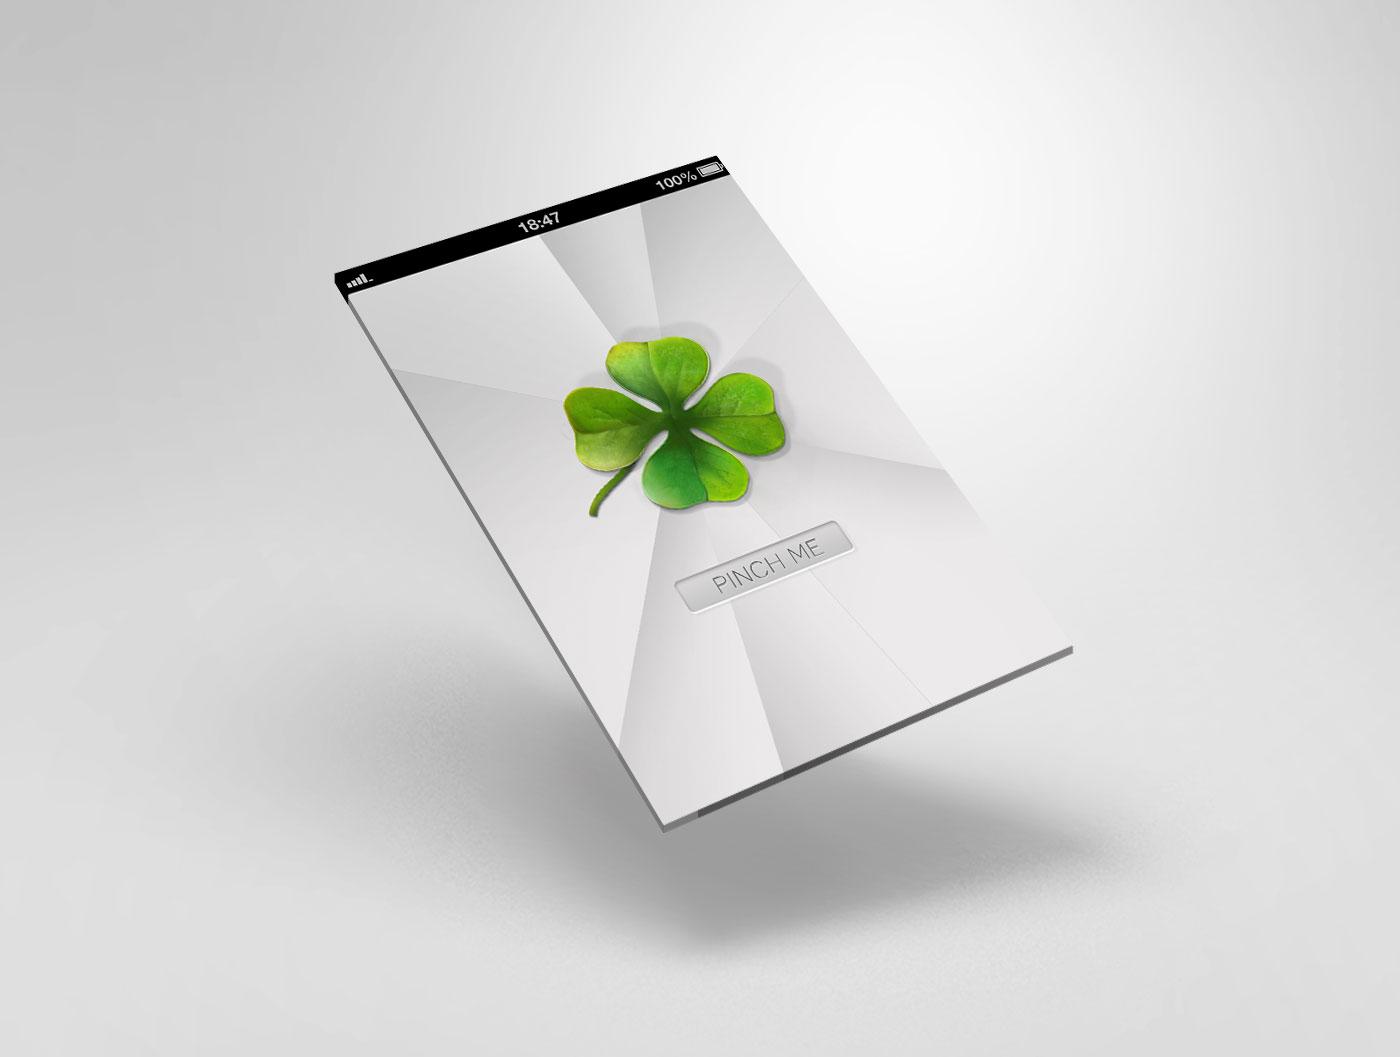 Opening screen: when pinching the clover (quadrifoglio) 4 menu items appear